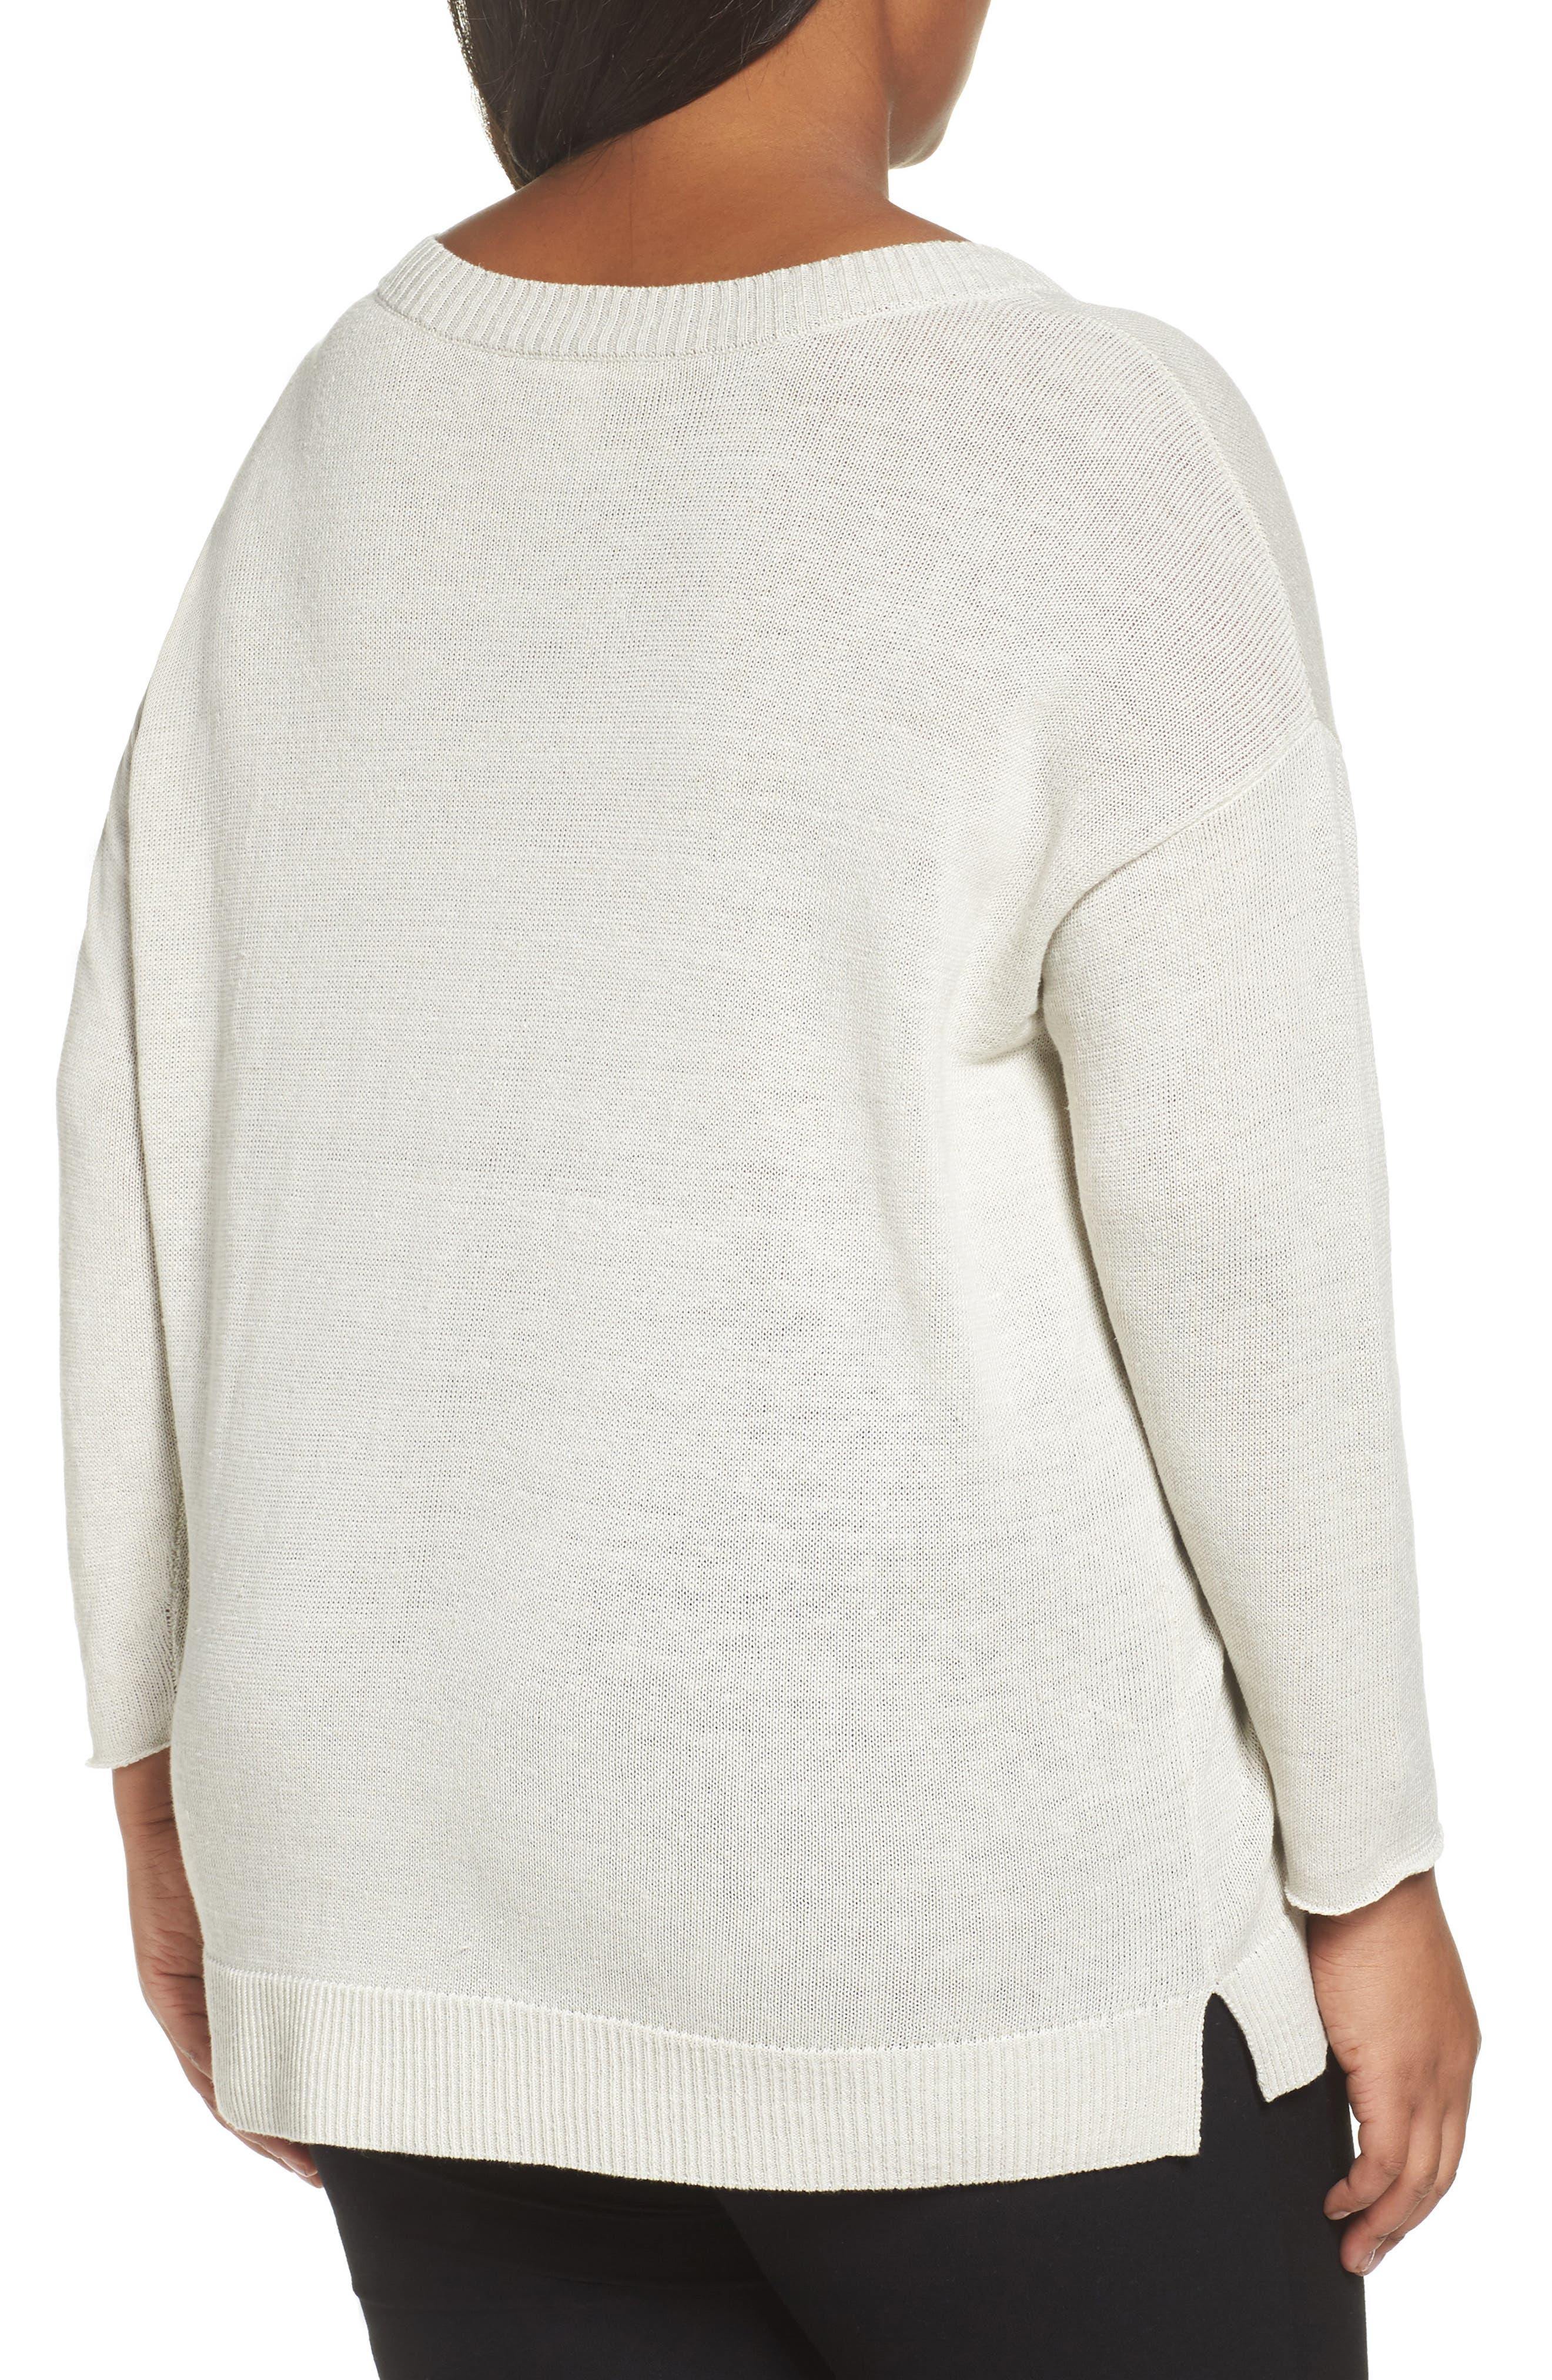 Organic Linen Sweater,                             Alternate thumbnail 2, color,                             Bone